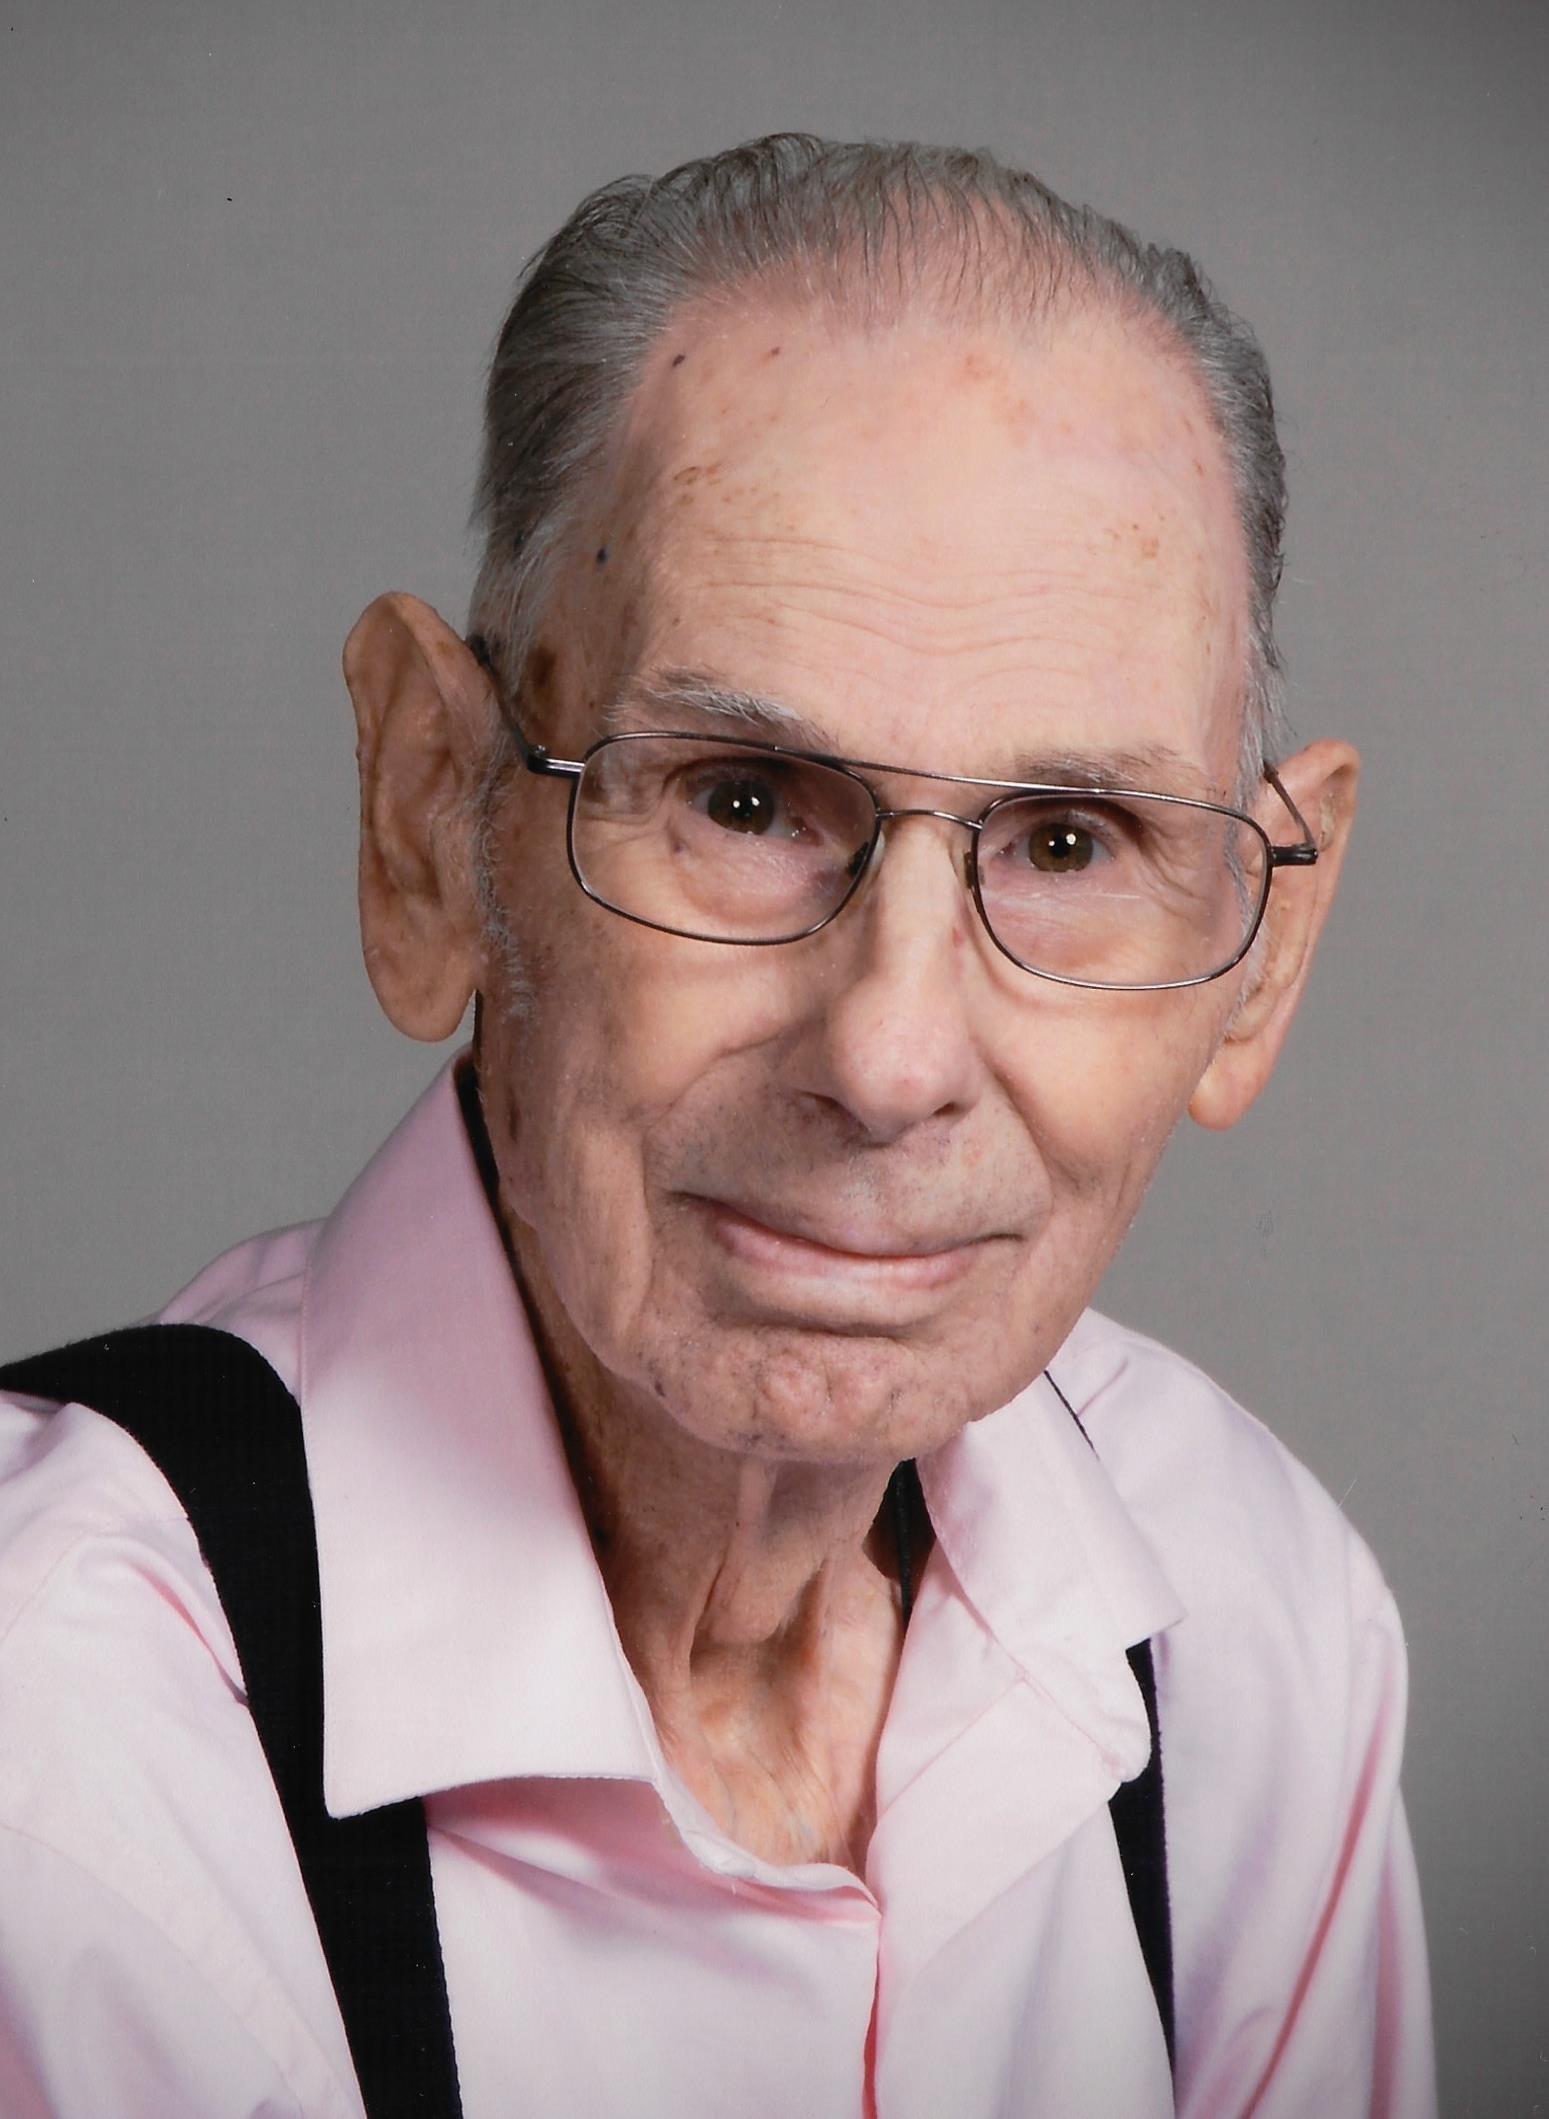 Marvin E. Elmore